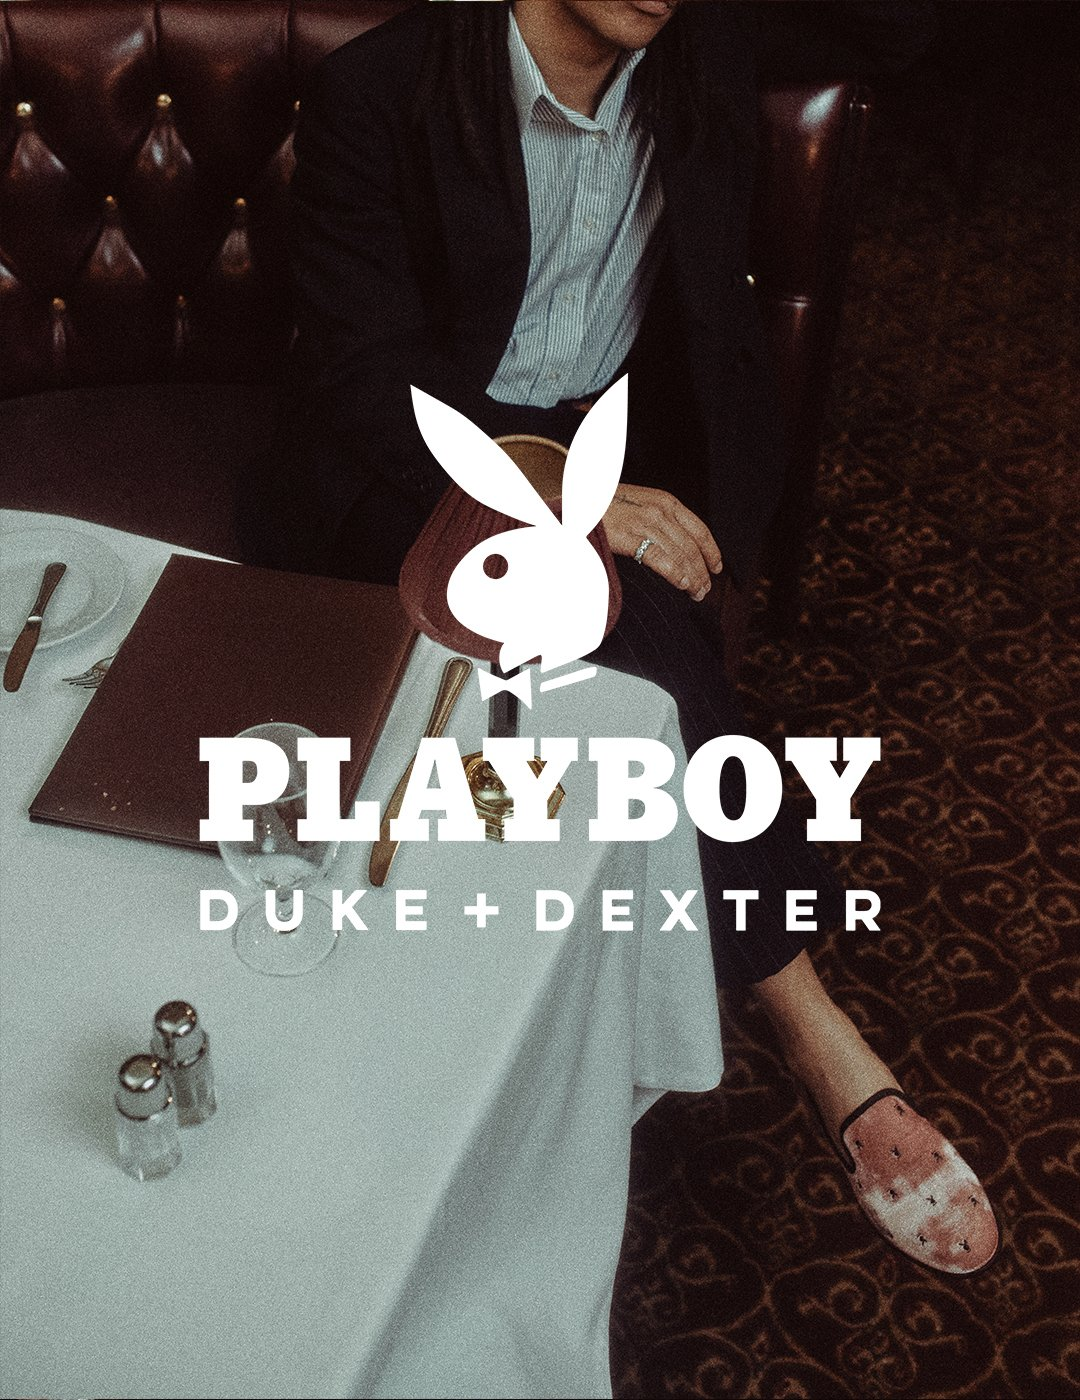 Duke+Dexter x Playboy Campaign